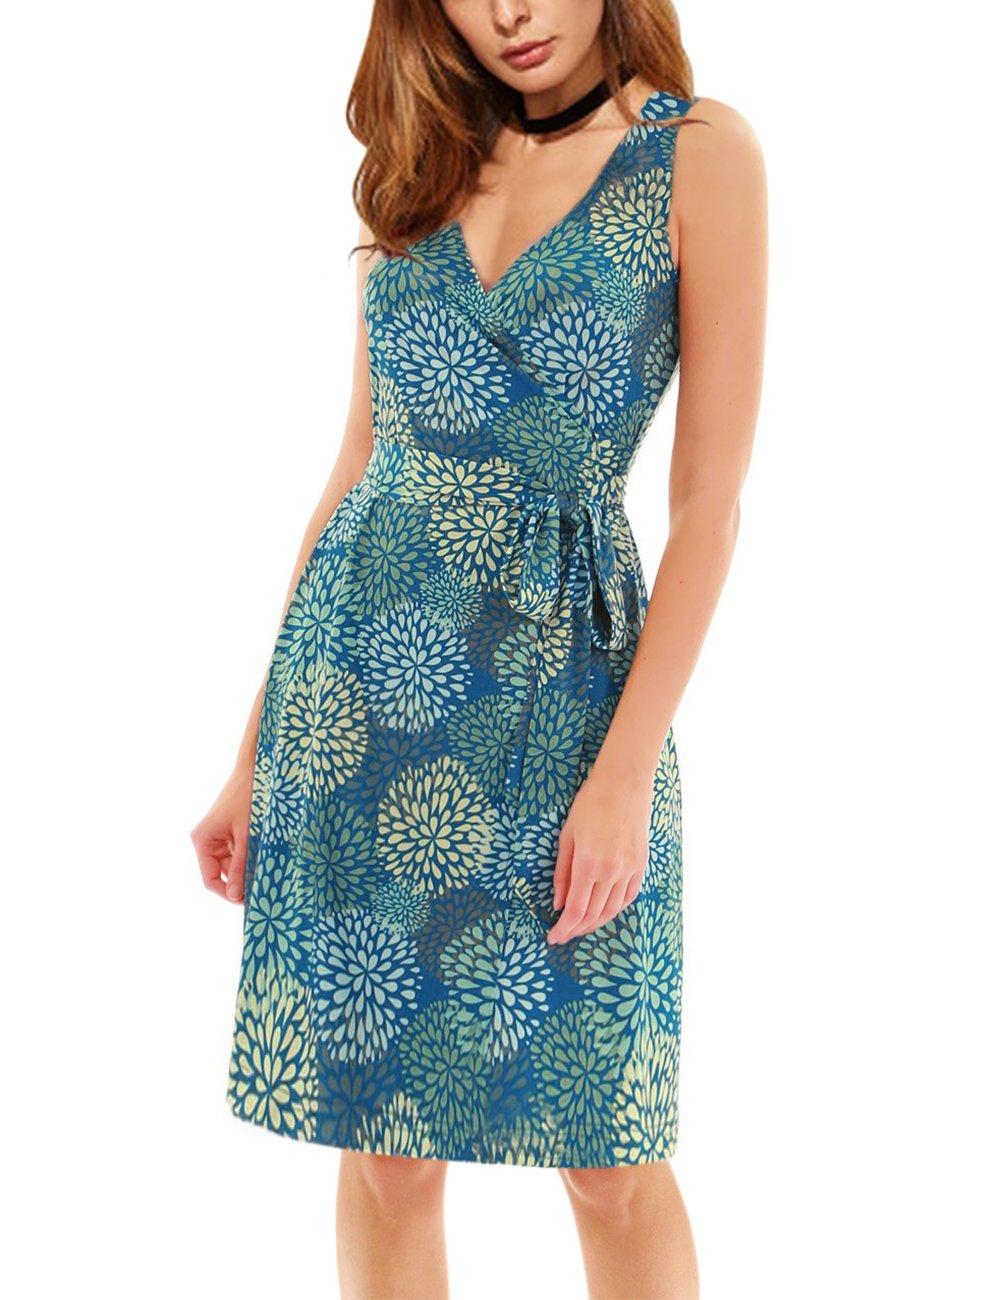 YesFashion Women's Wrap V Neck Sleeveless Print Dress Green M